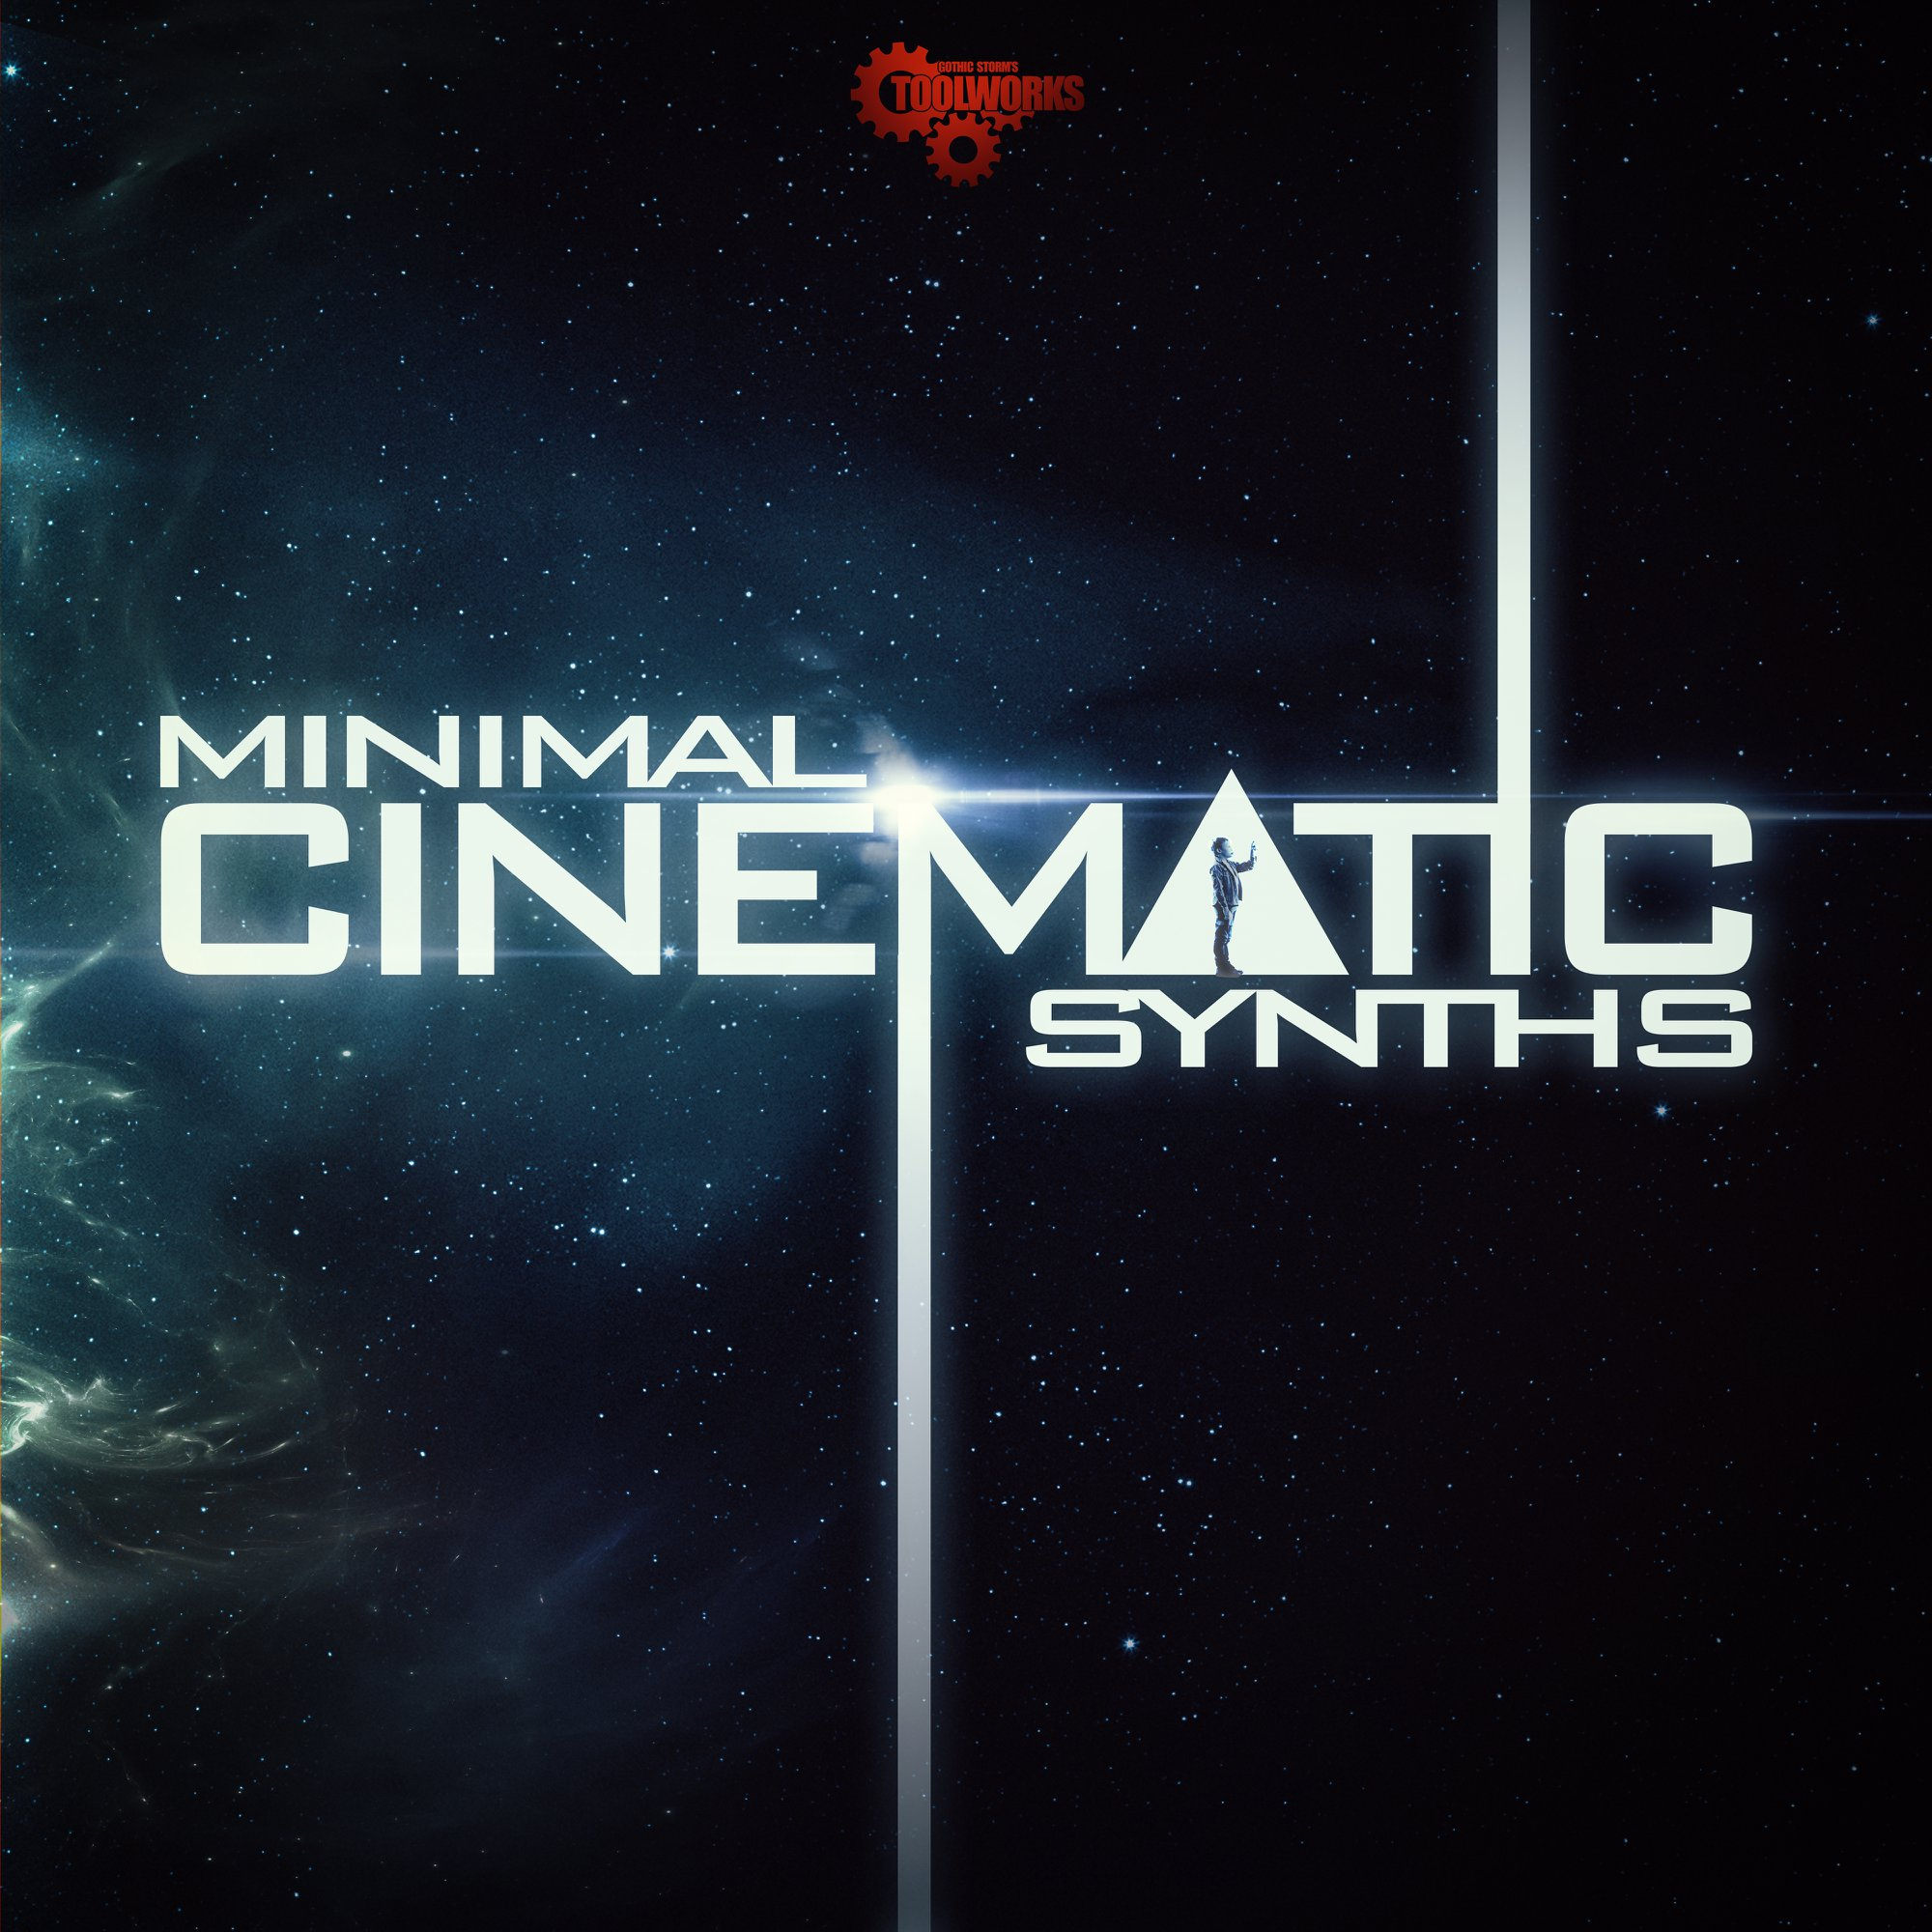 Minimal Cinematic Synths